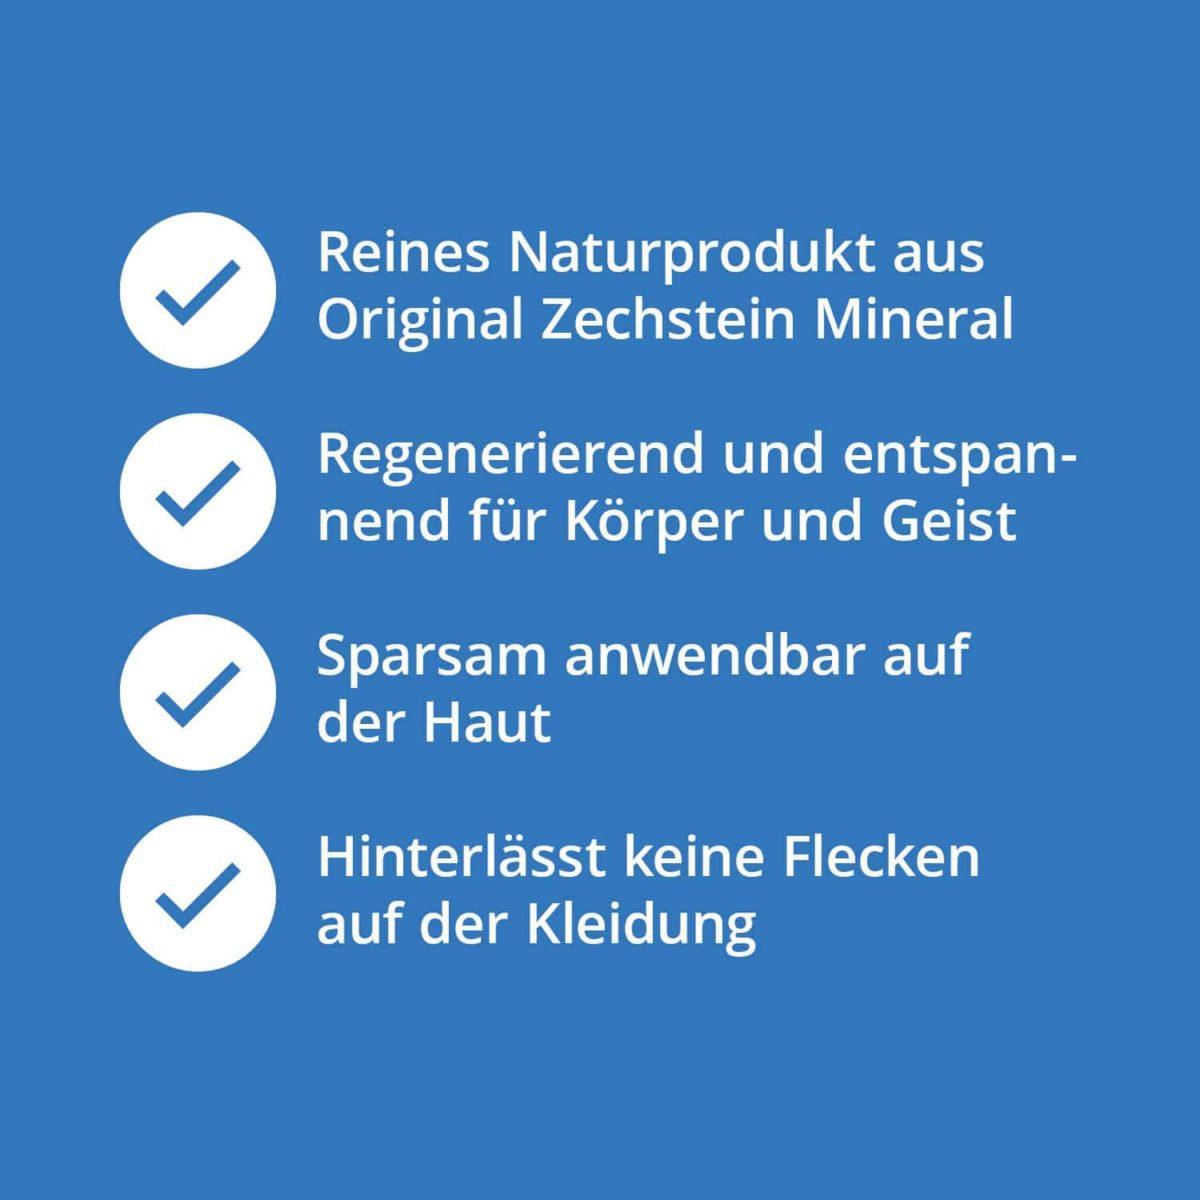 Casida Magnesiumöl Vital Zechstein 1000 ml 11730233 PZN Apotheke Nachfüllflasche Sport7